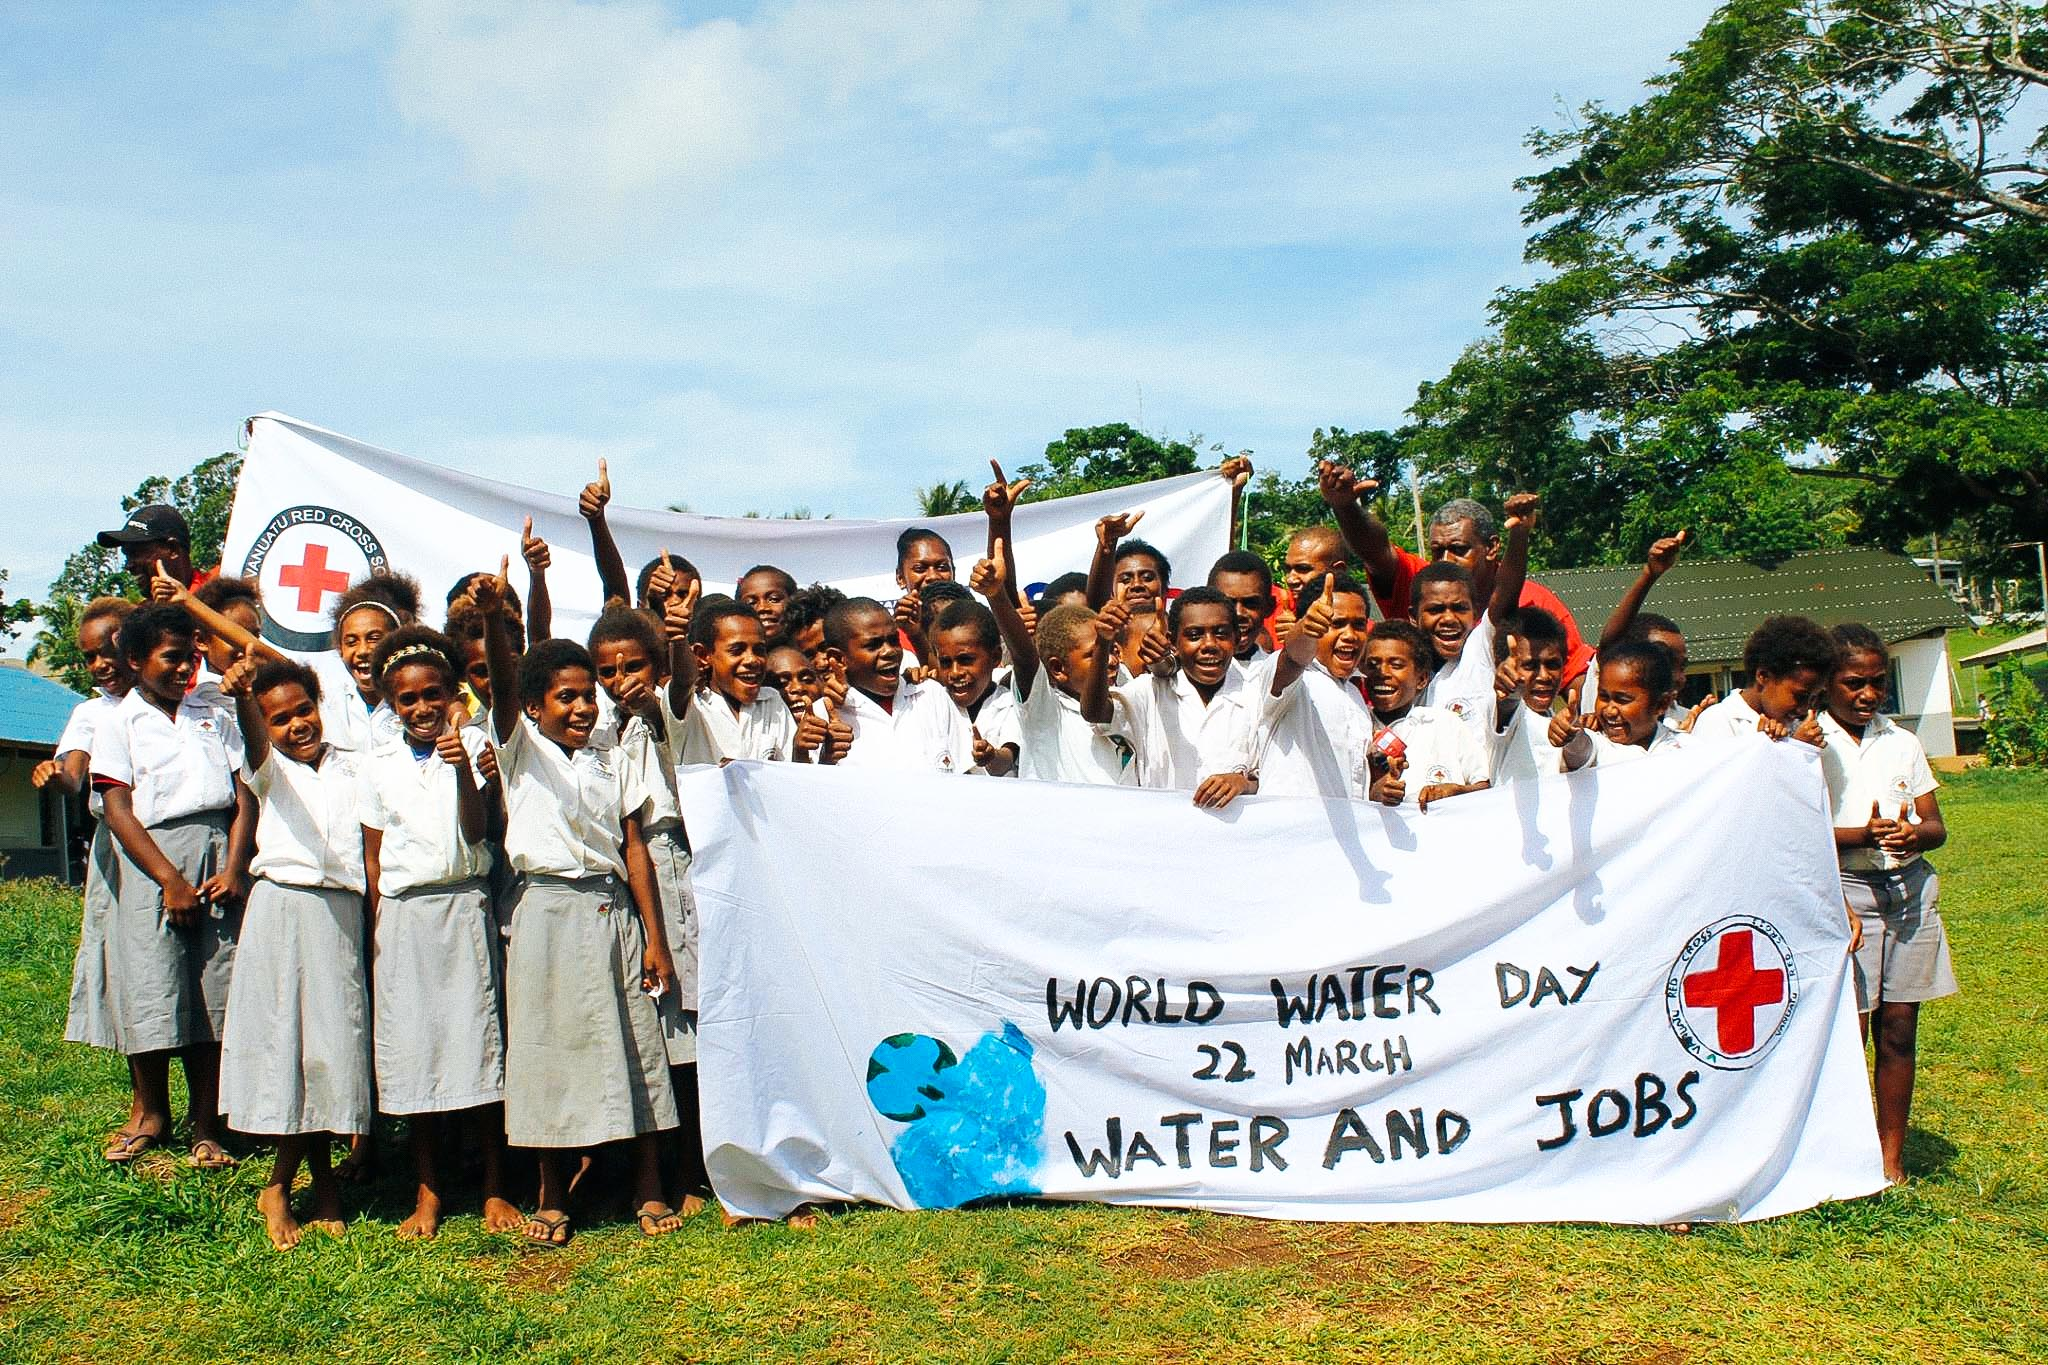 Source: Xavier Watt, Vanuatu Red Cross